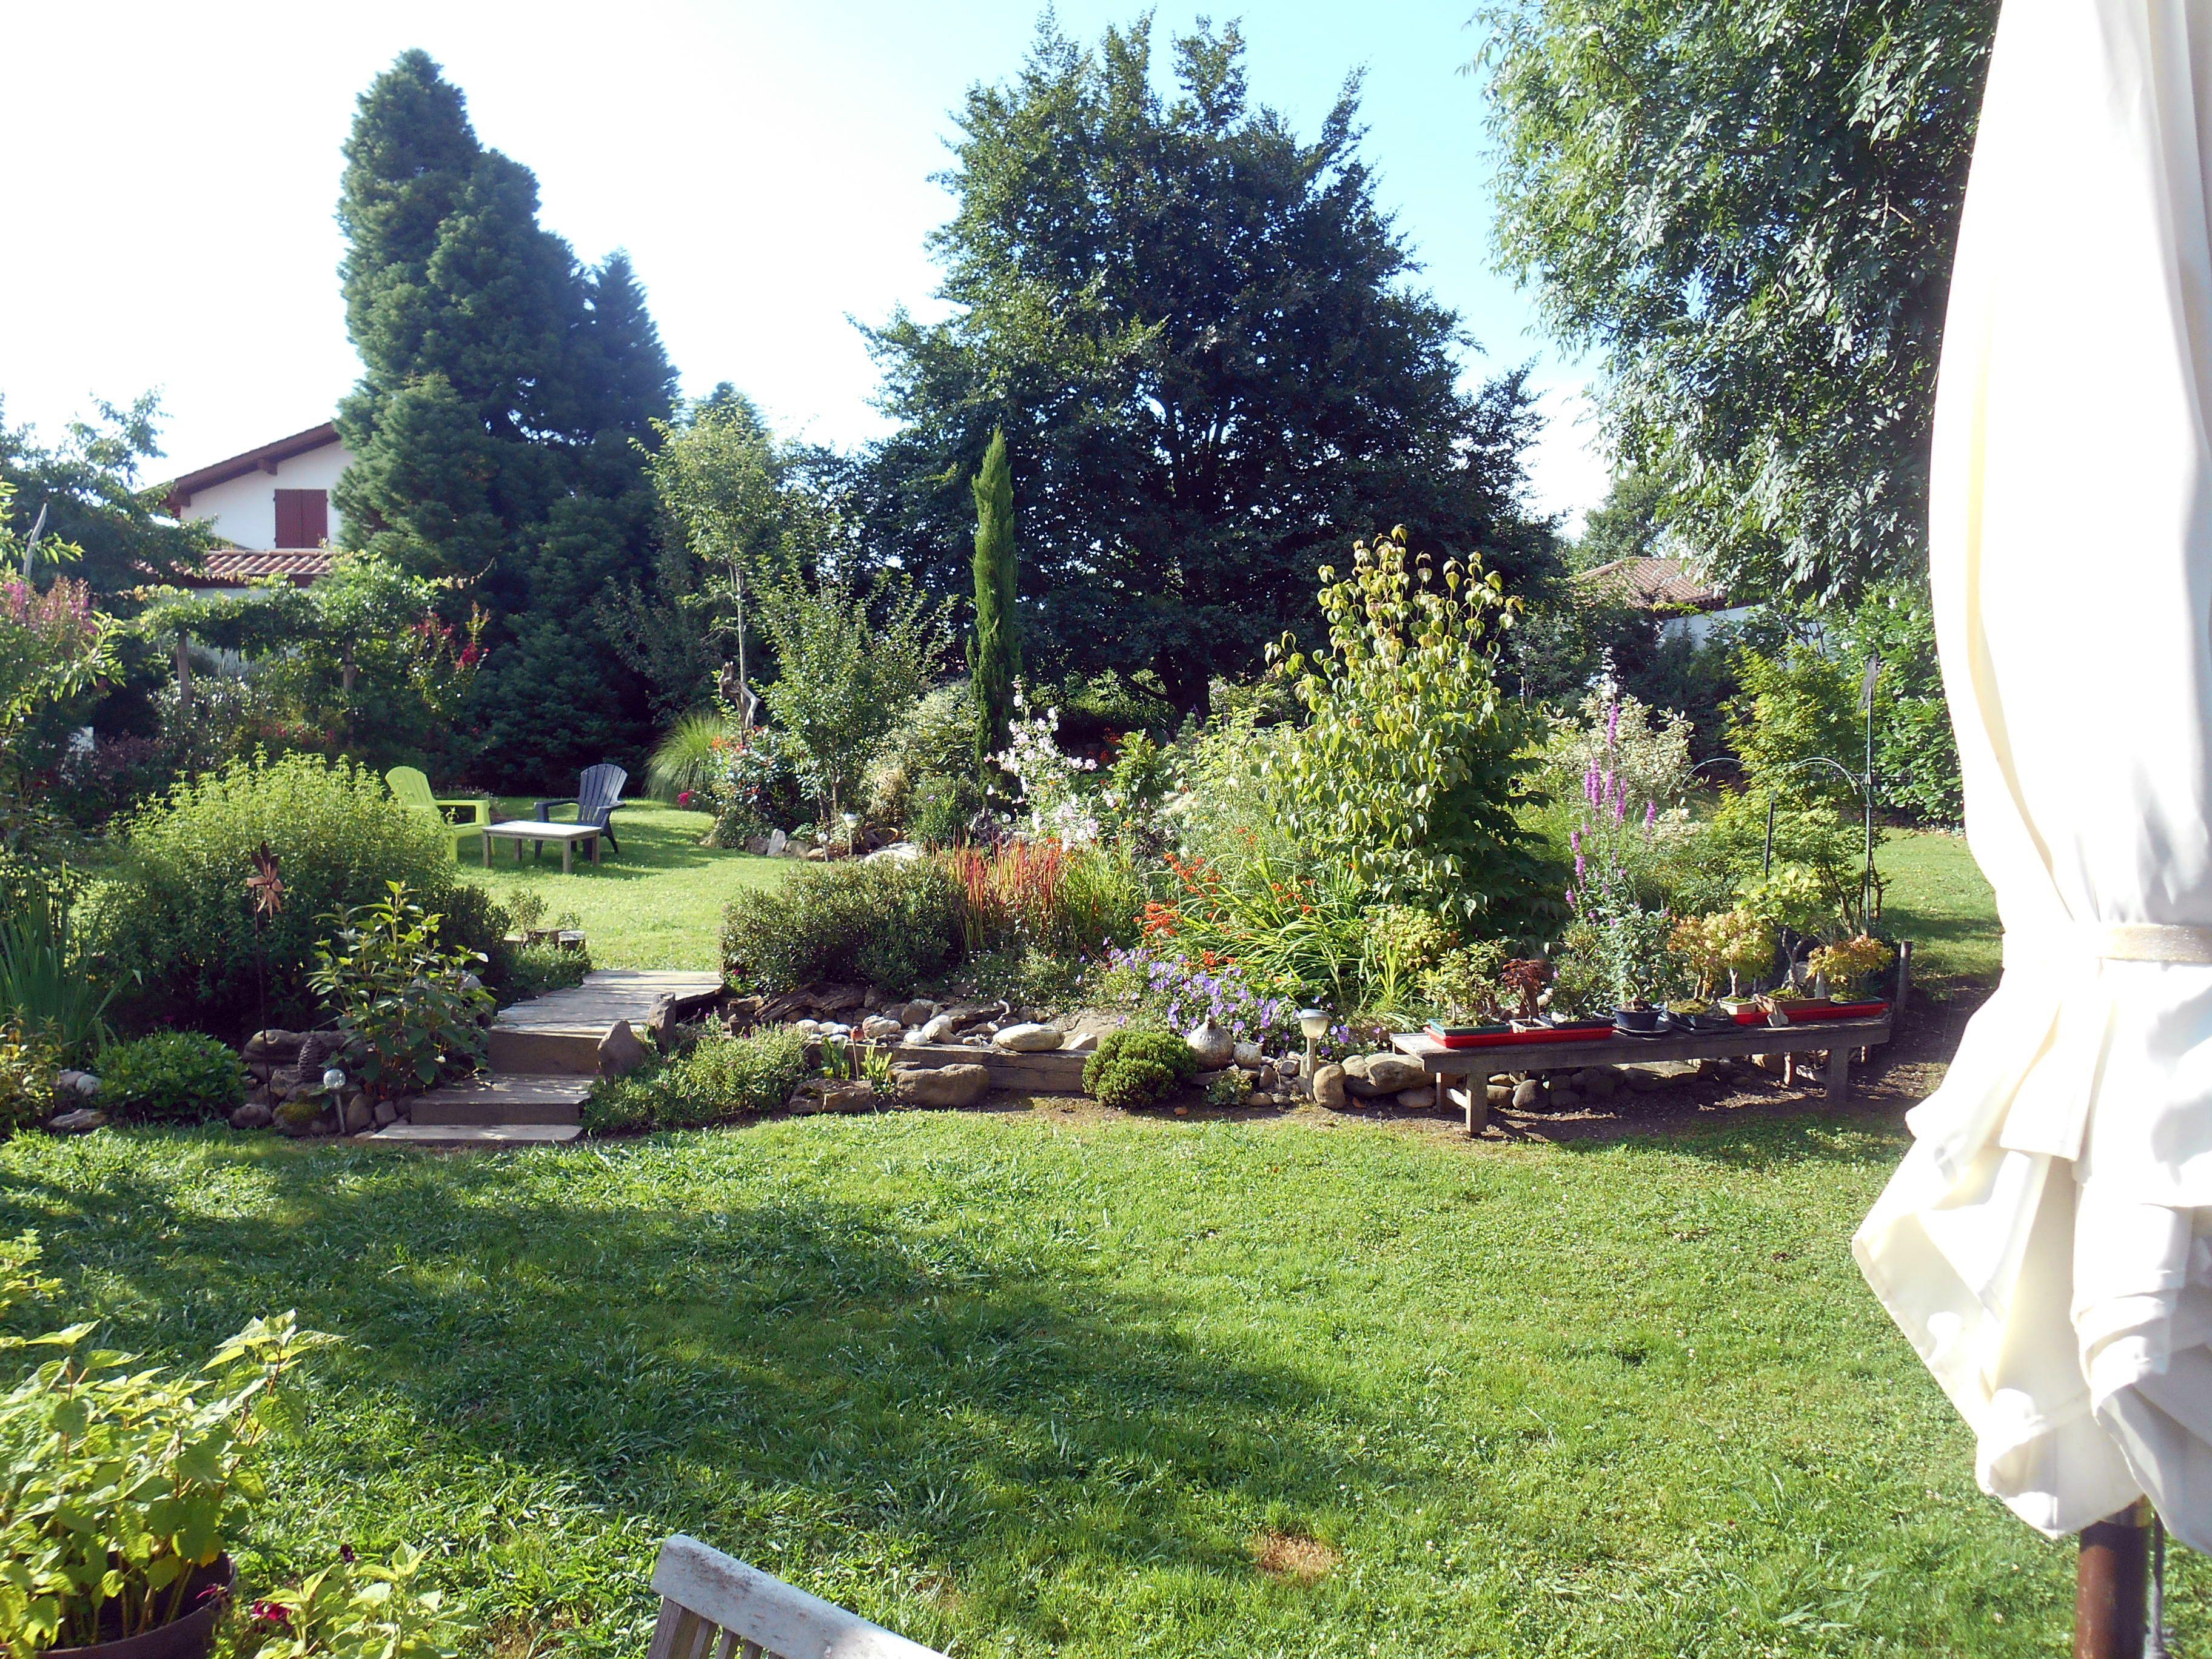 le jardin juillet 2017 lanoki pinterest juillet le jardin